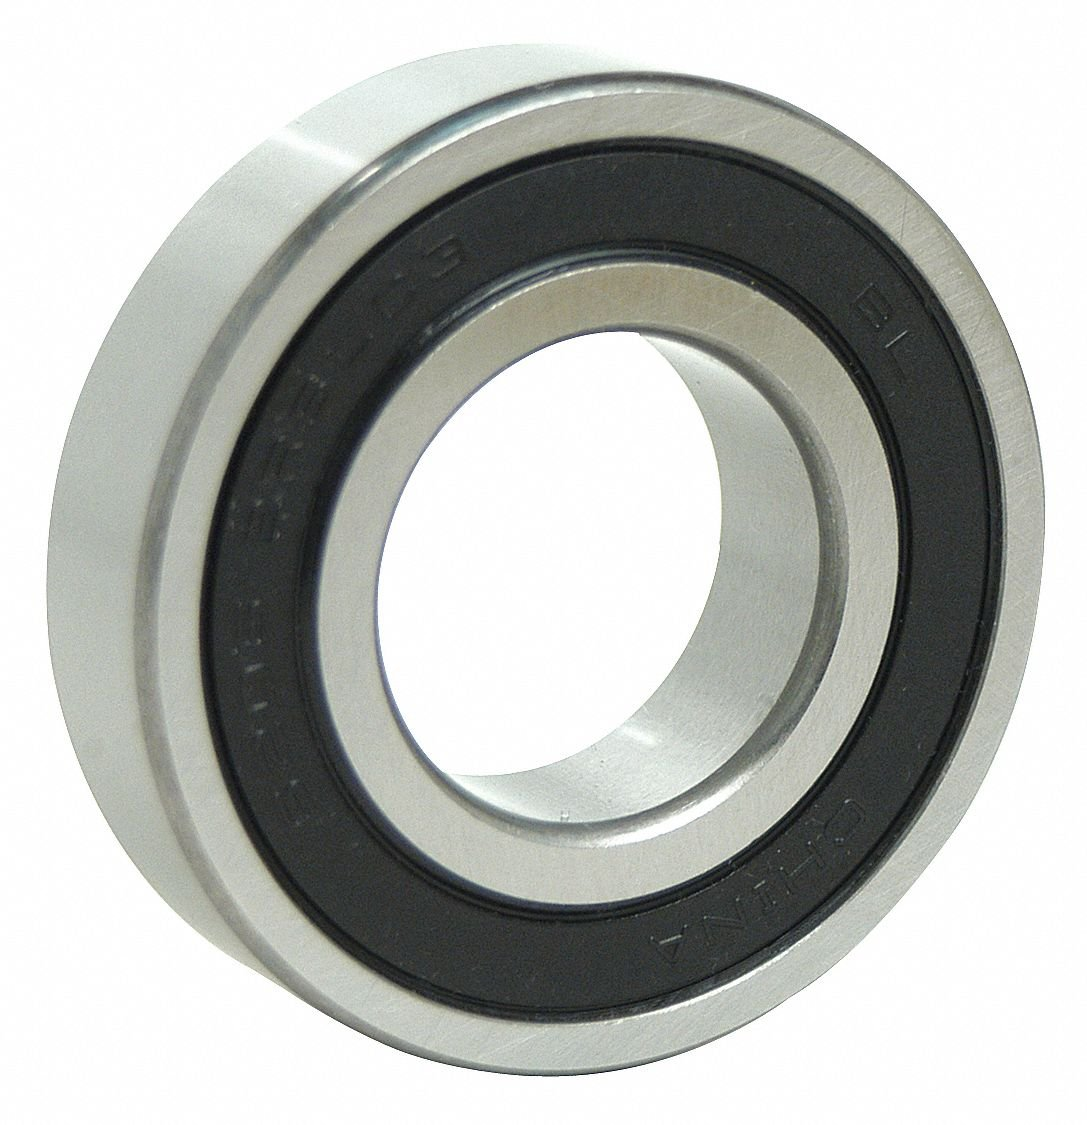 Radial Ball Bearing, PS, 35mm, 6307-2RS